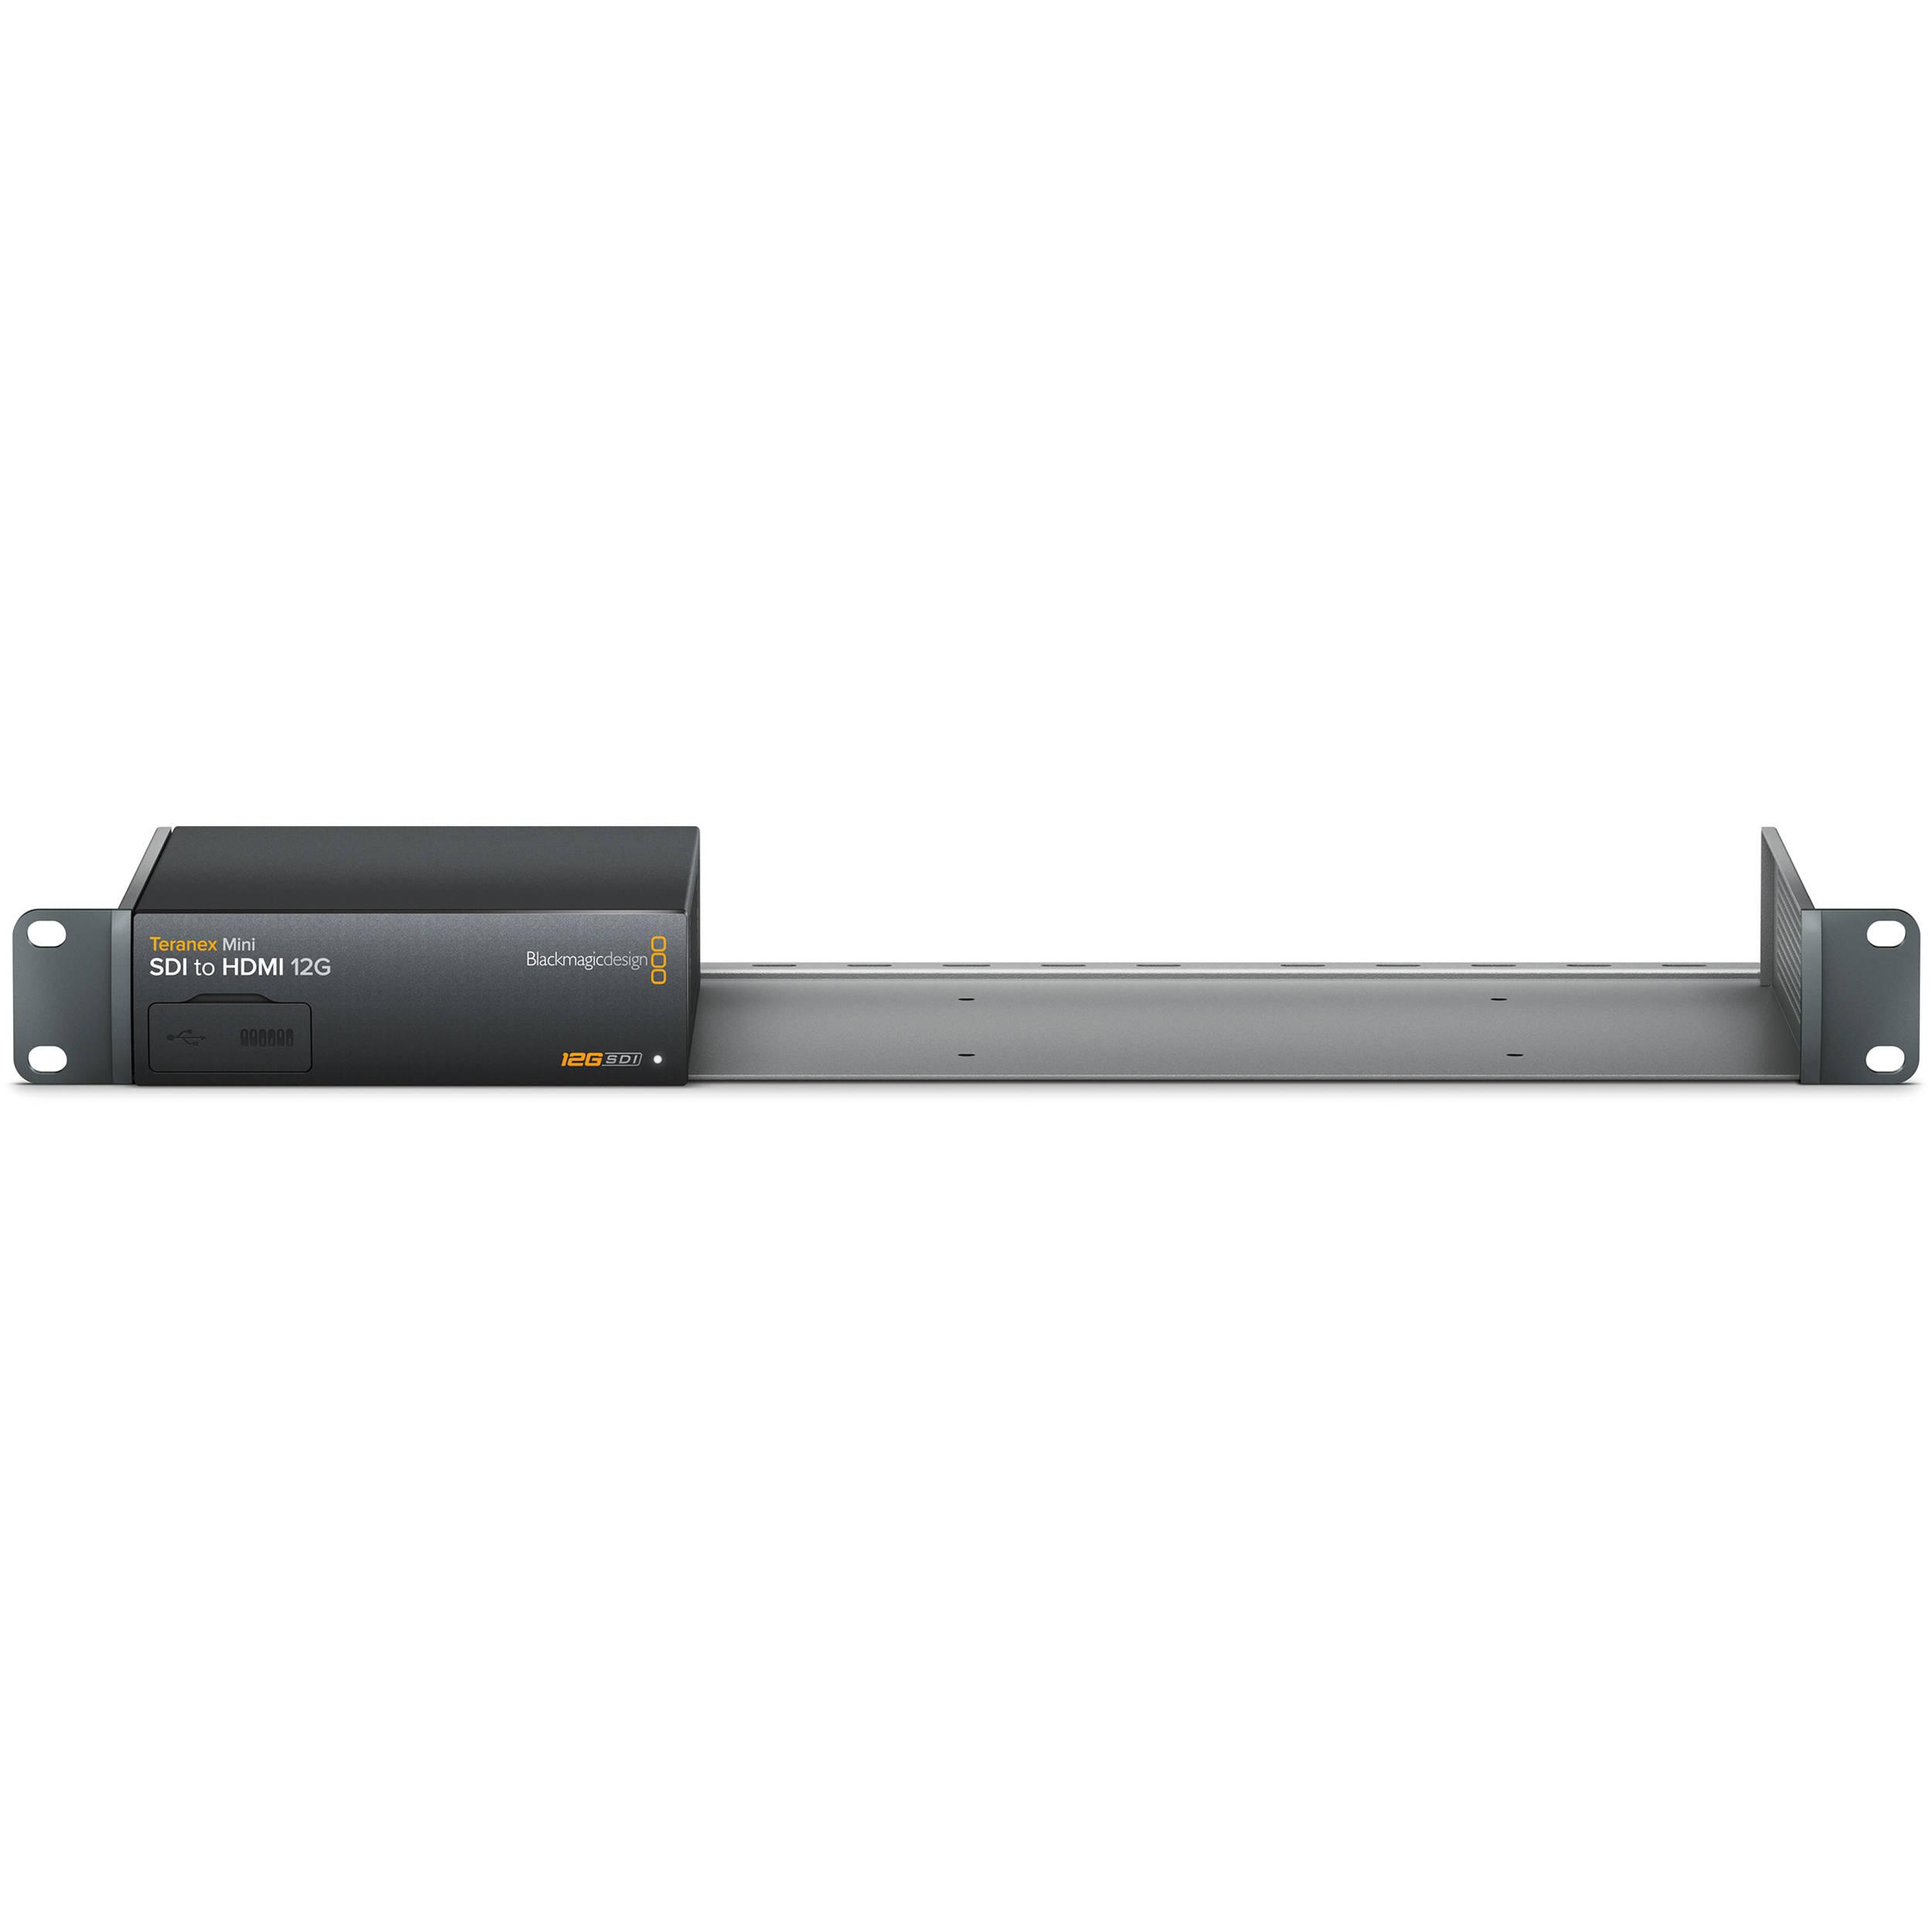 Electronics Accessories Supplies Bundle Hyperdeck Studio Mini 1ru Teranex Mini Rack Shelf Blackmagic Design Atem Television Studio Hd Rahetamaddon Ir